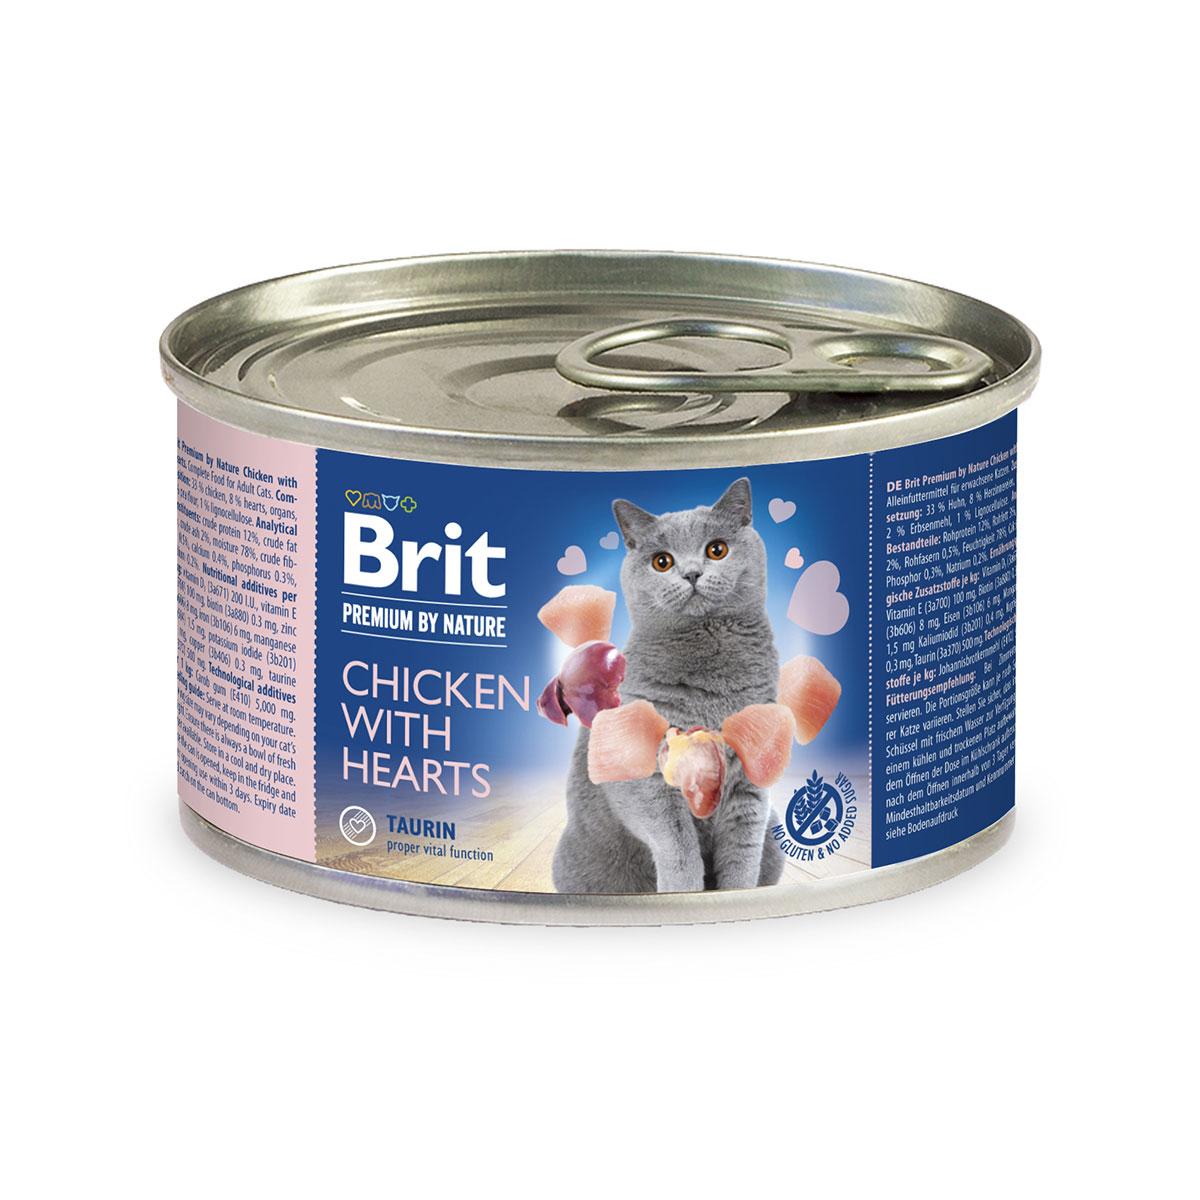 Brit Premium by Nature Chicken with Hearts200g